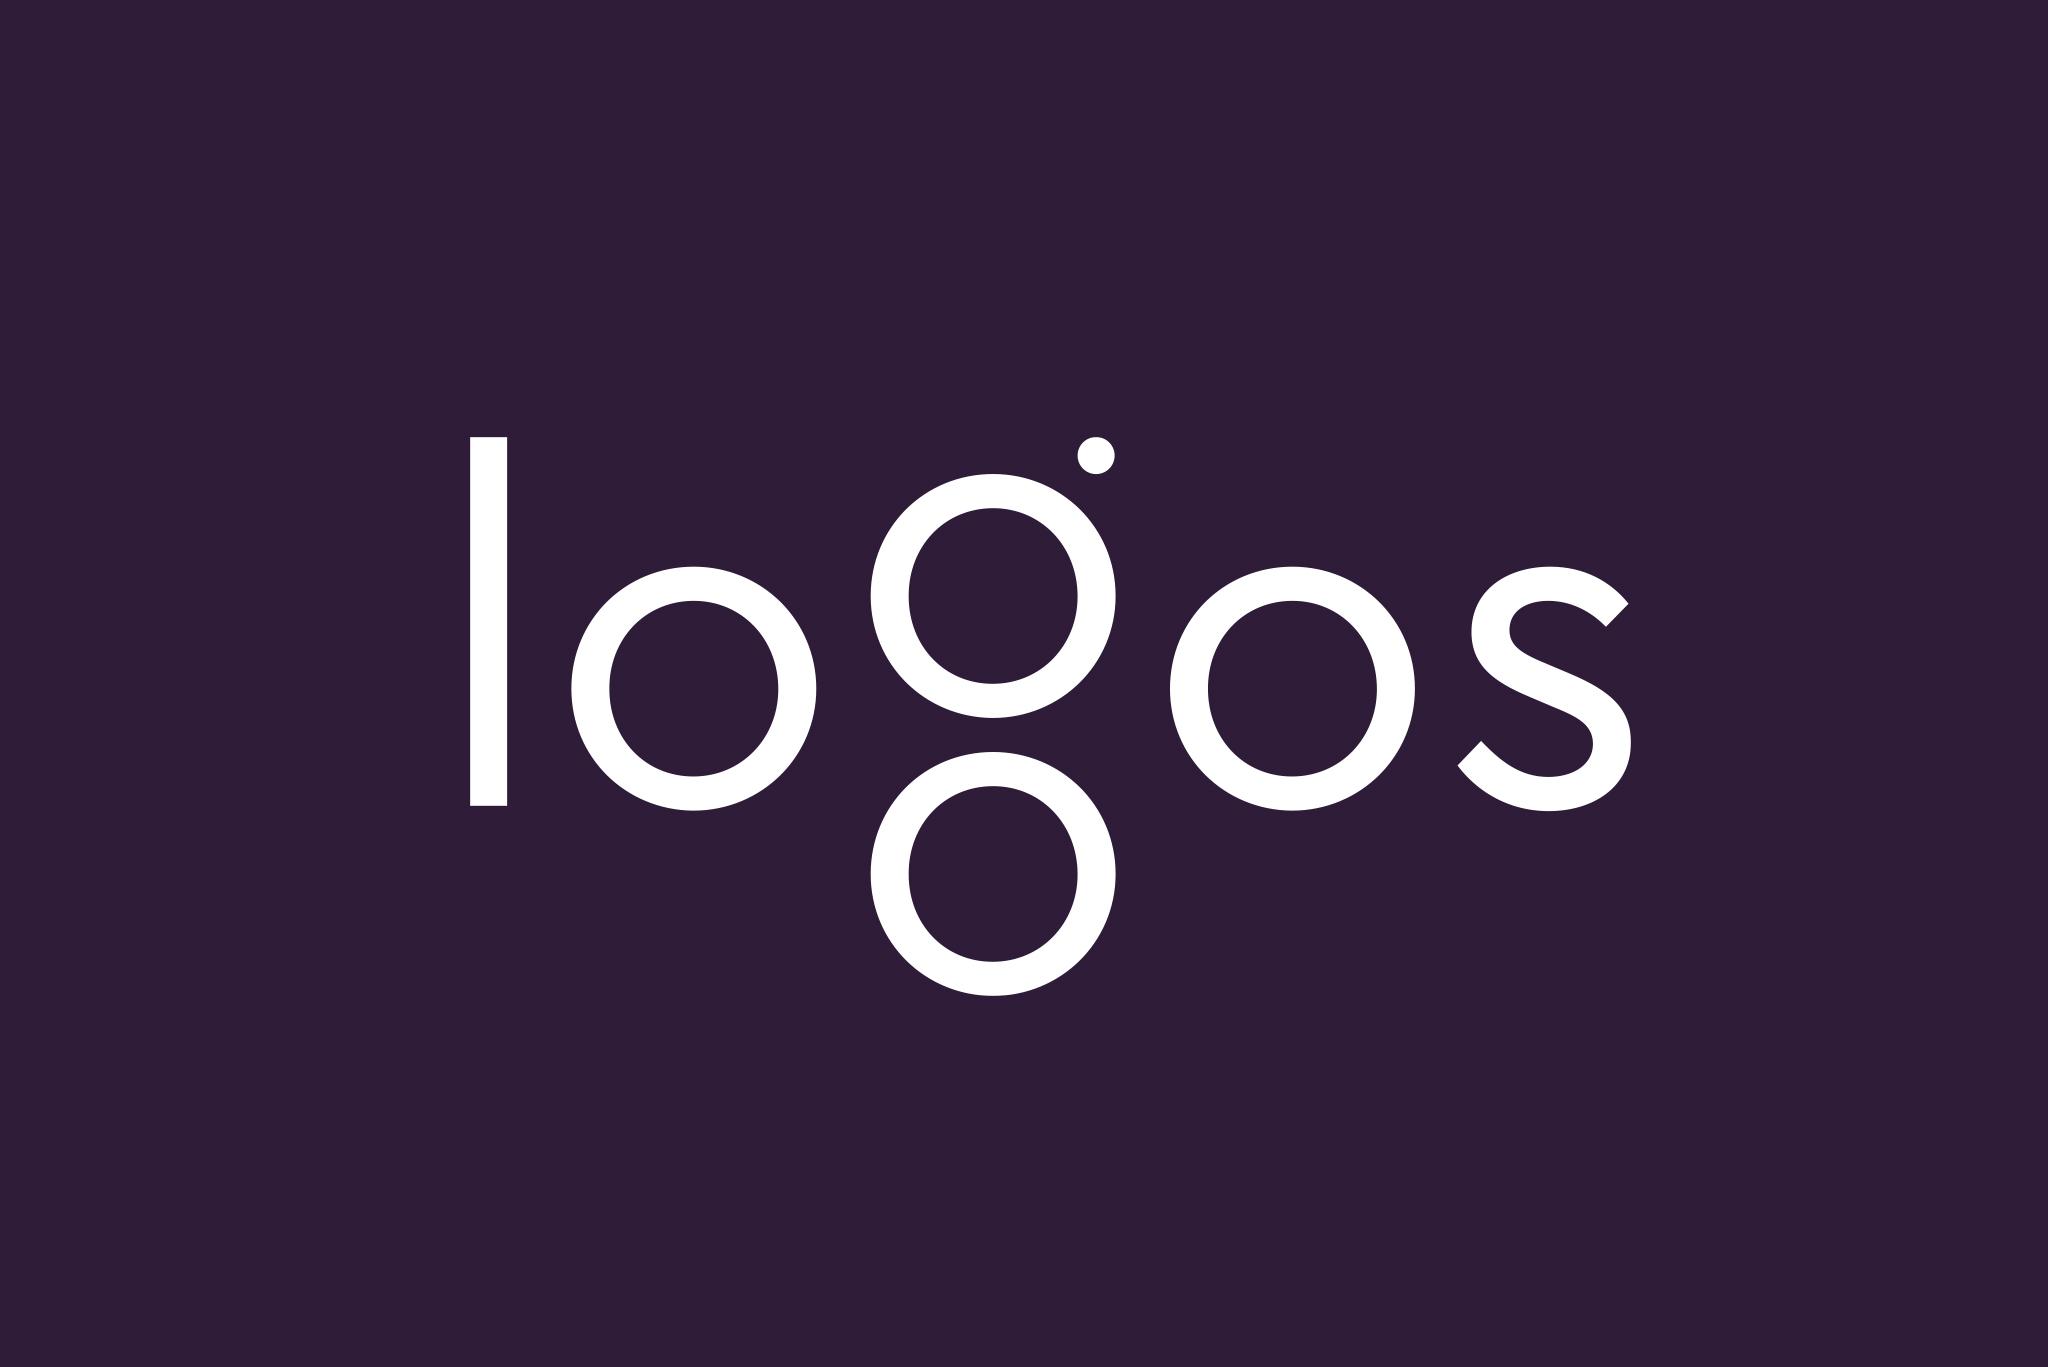 logos visuele identiteit